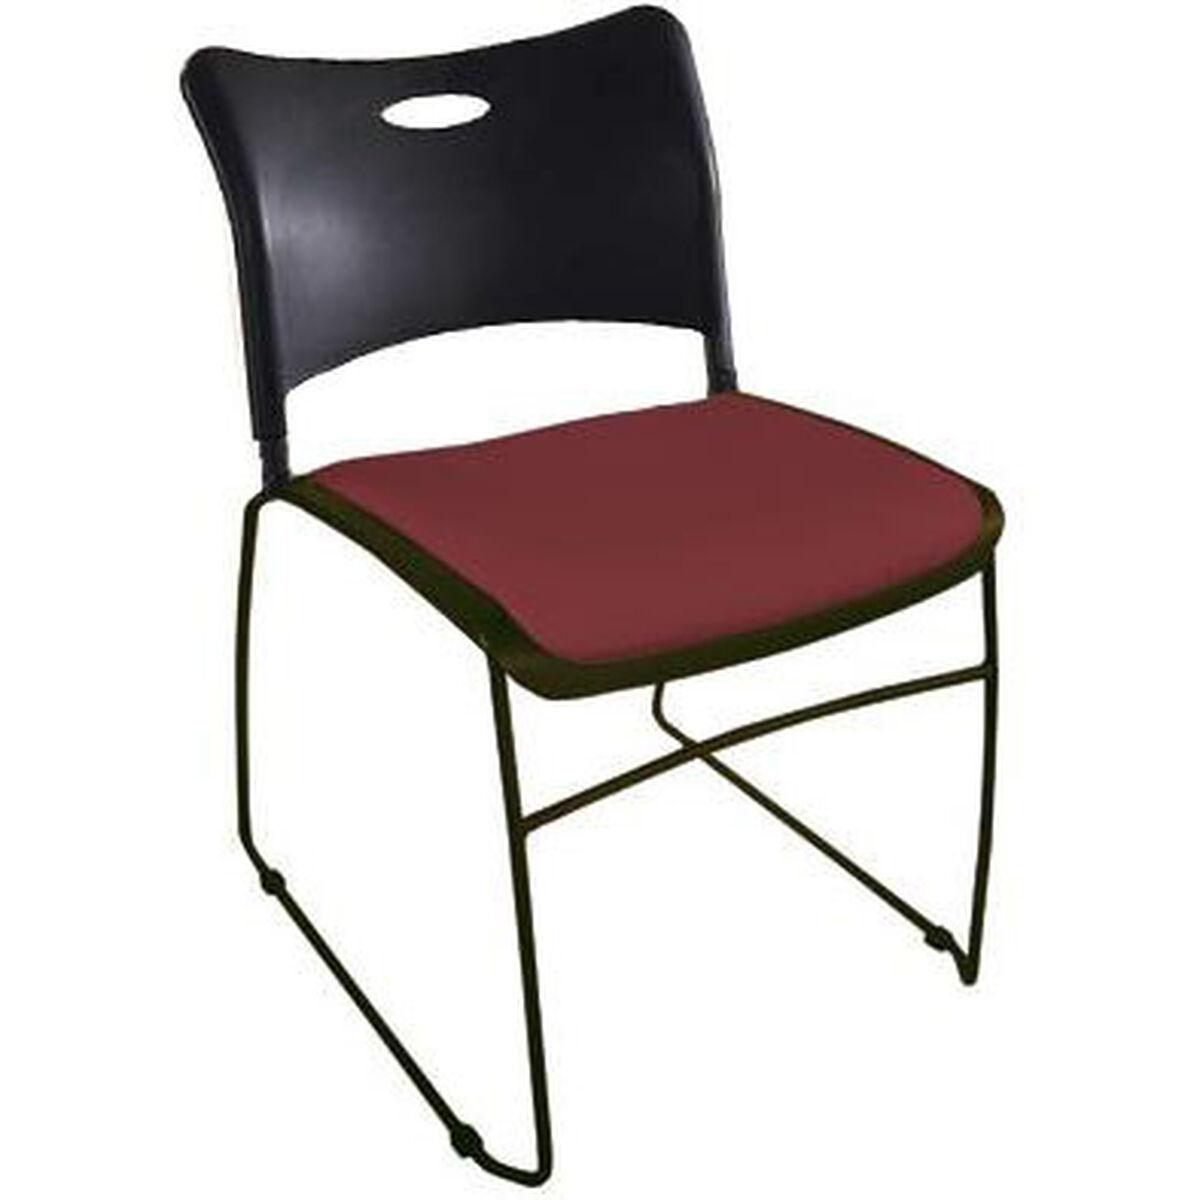 High Point Furniture Industries 723sc Hpf 723sc